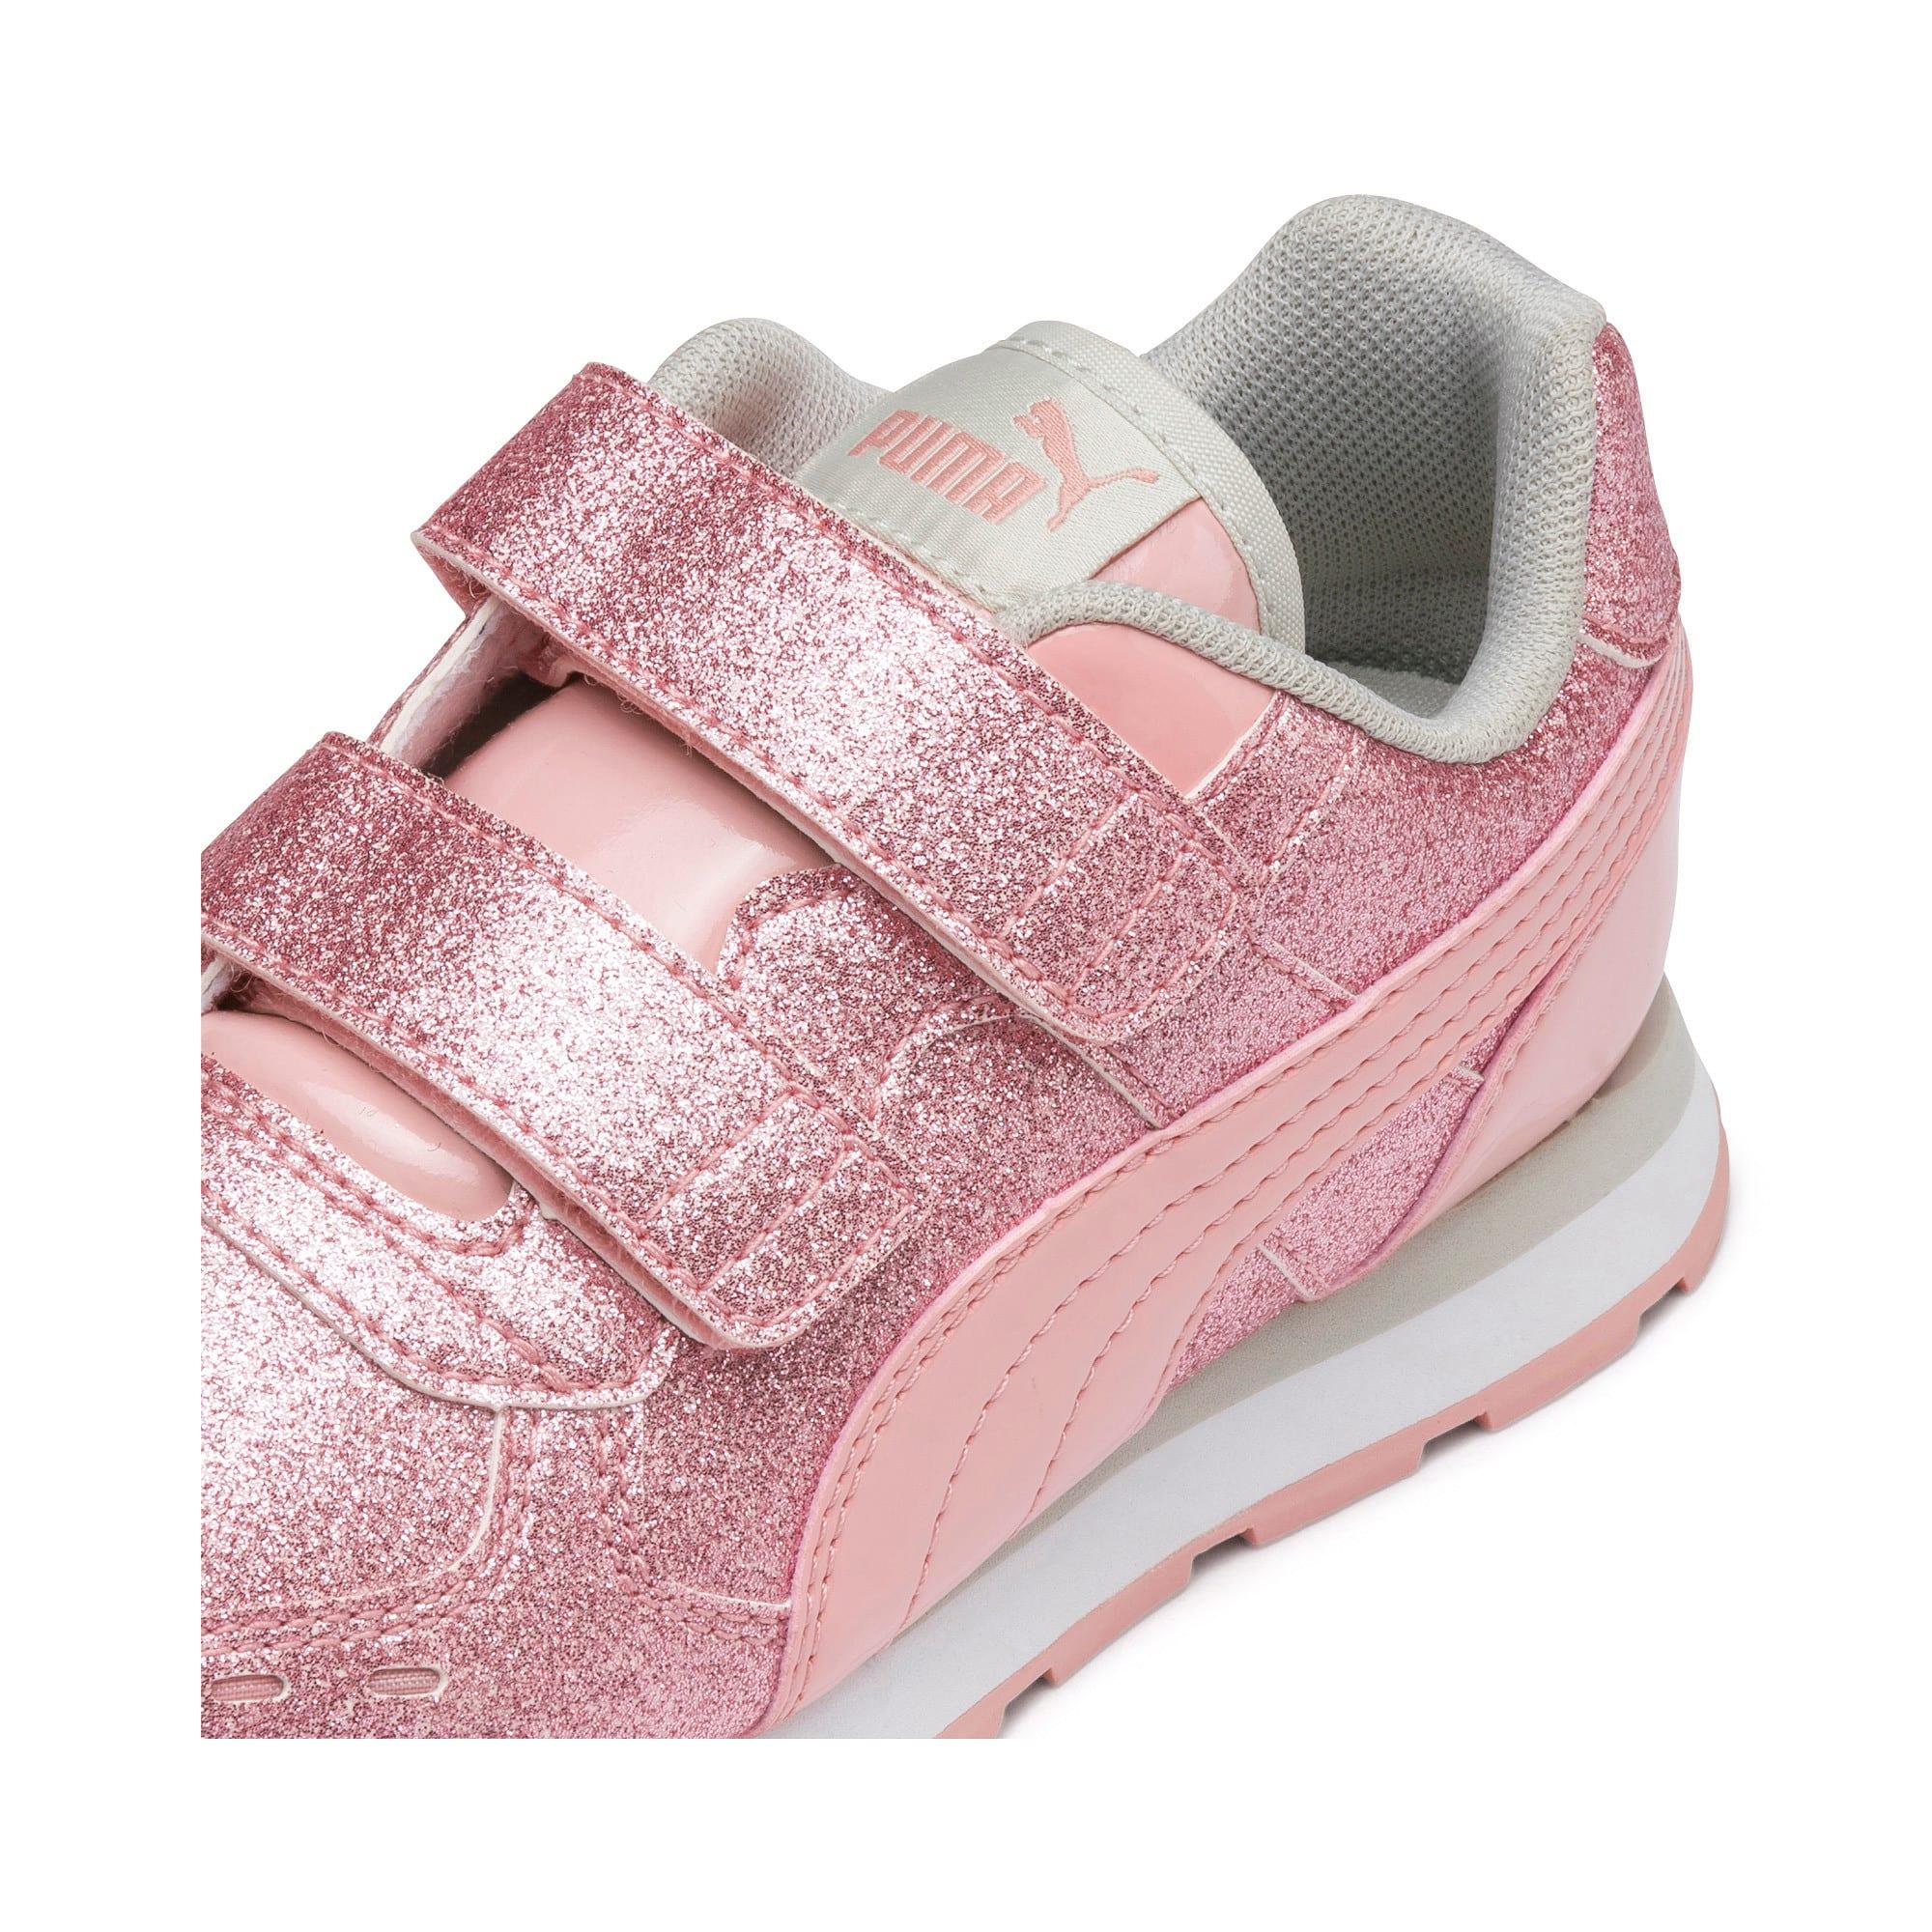 Miniatura 6 de Zapatos Vista Glitz para niña pequeña, Bridal Rose-Gray Violet, mediano